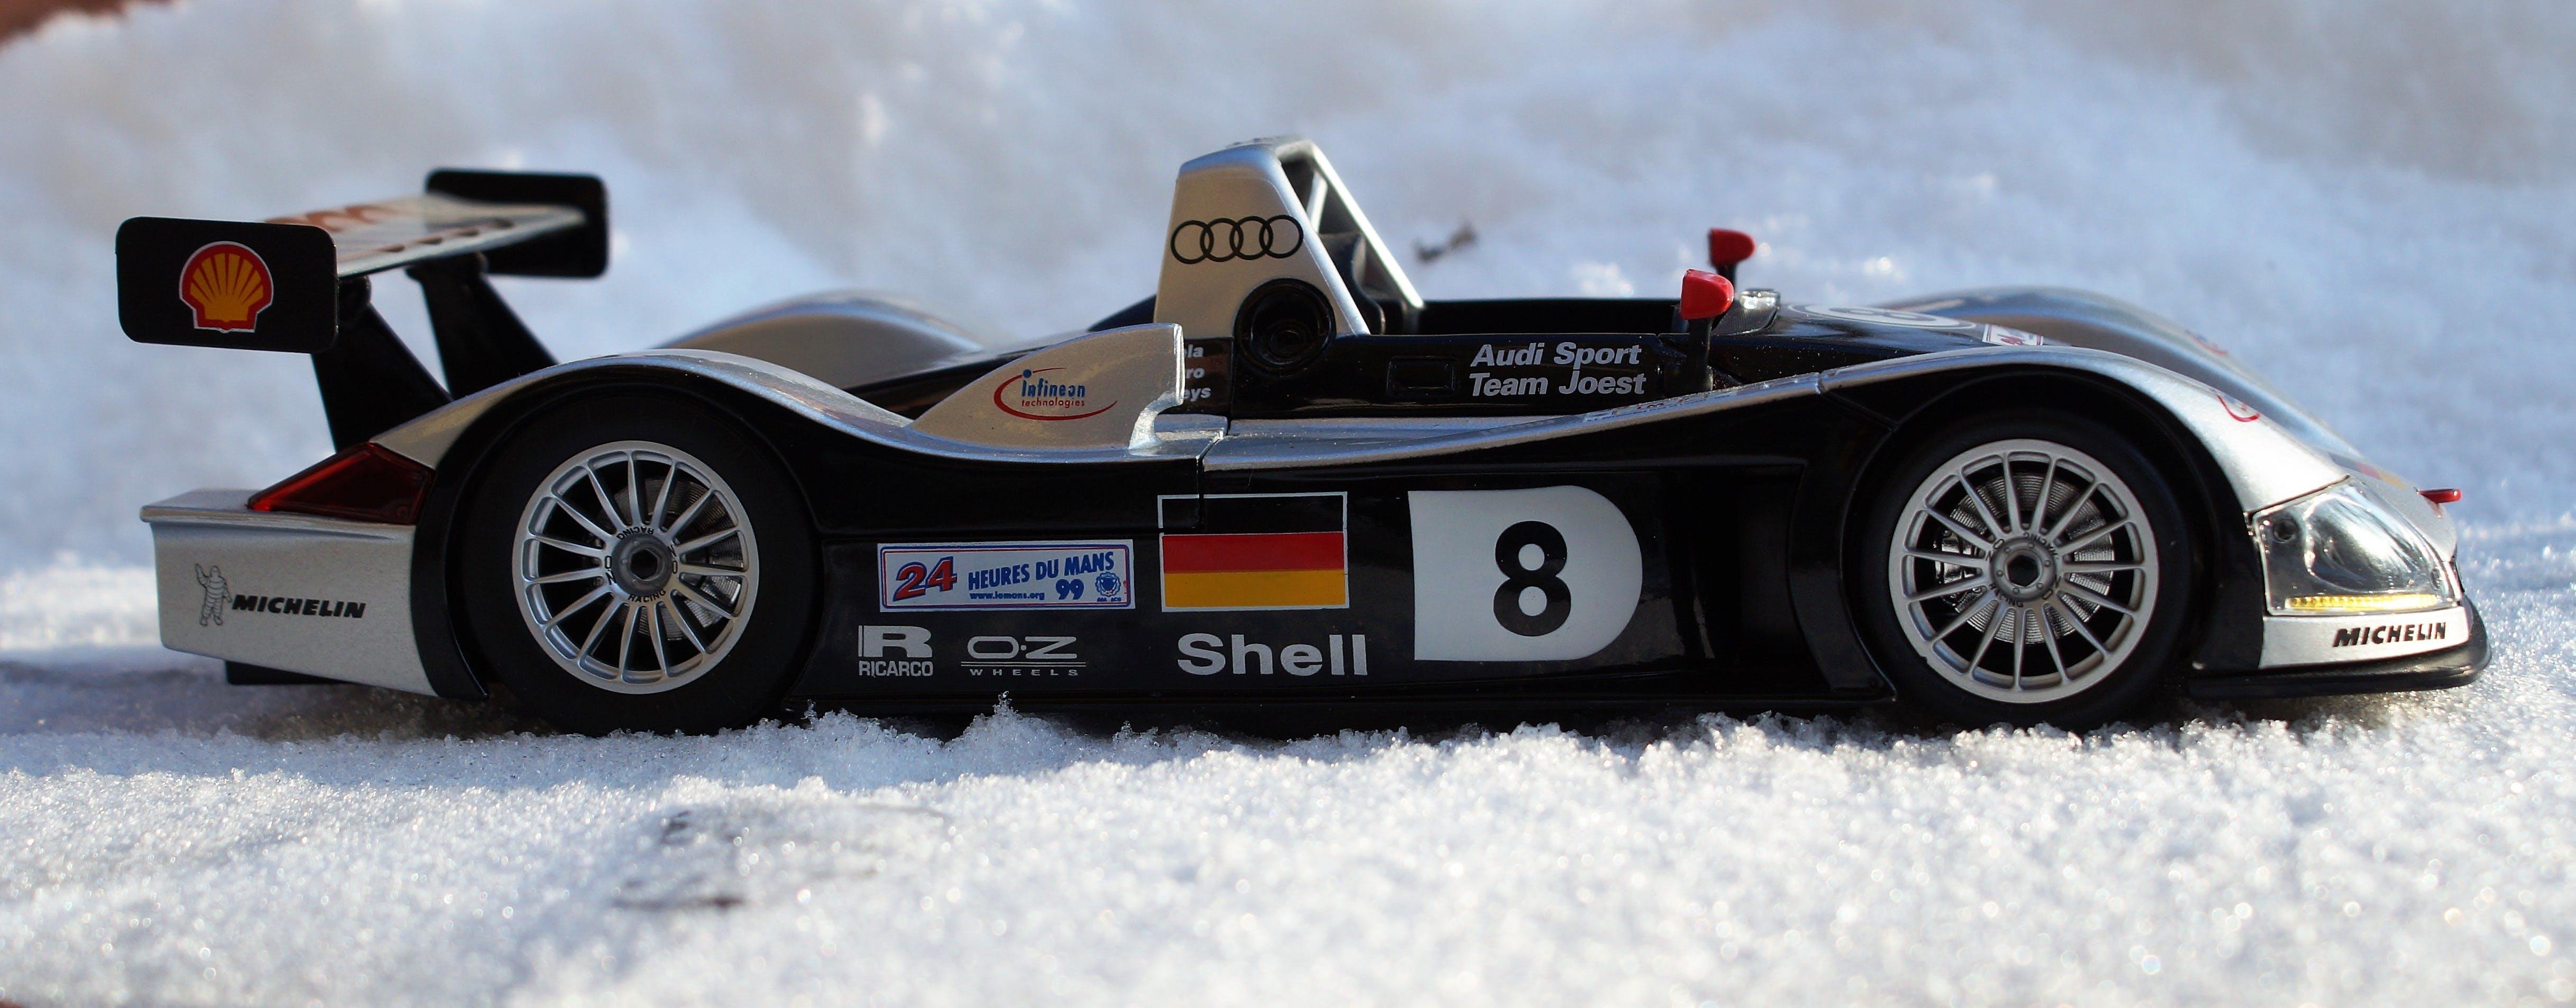 Free stock photo of snow, winter, vehicle, sports car